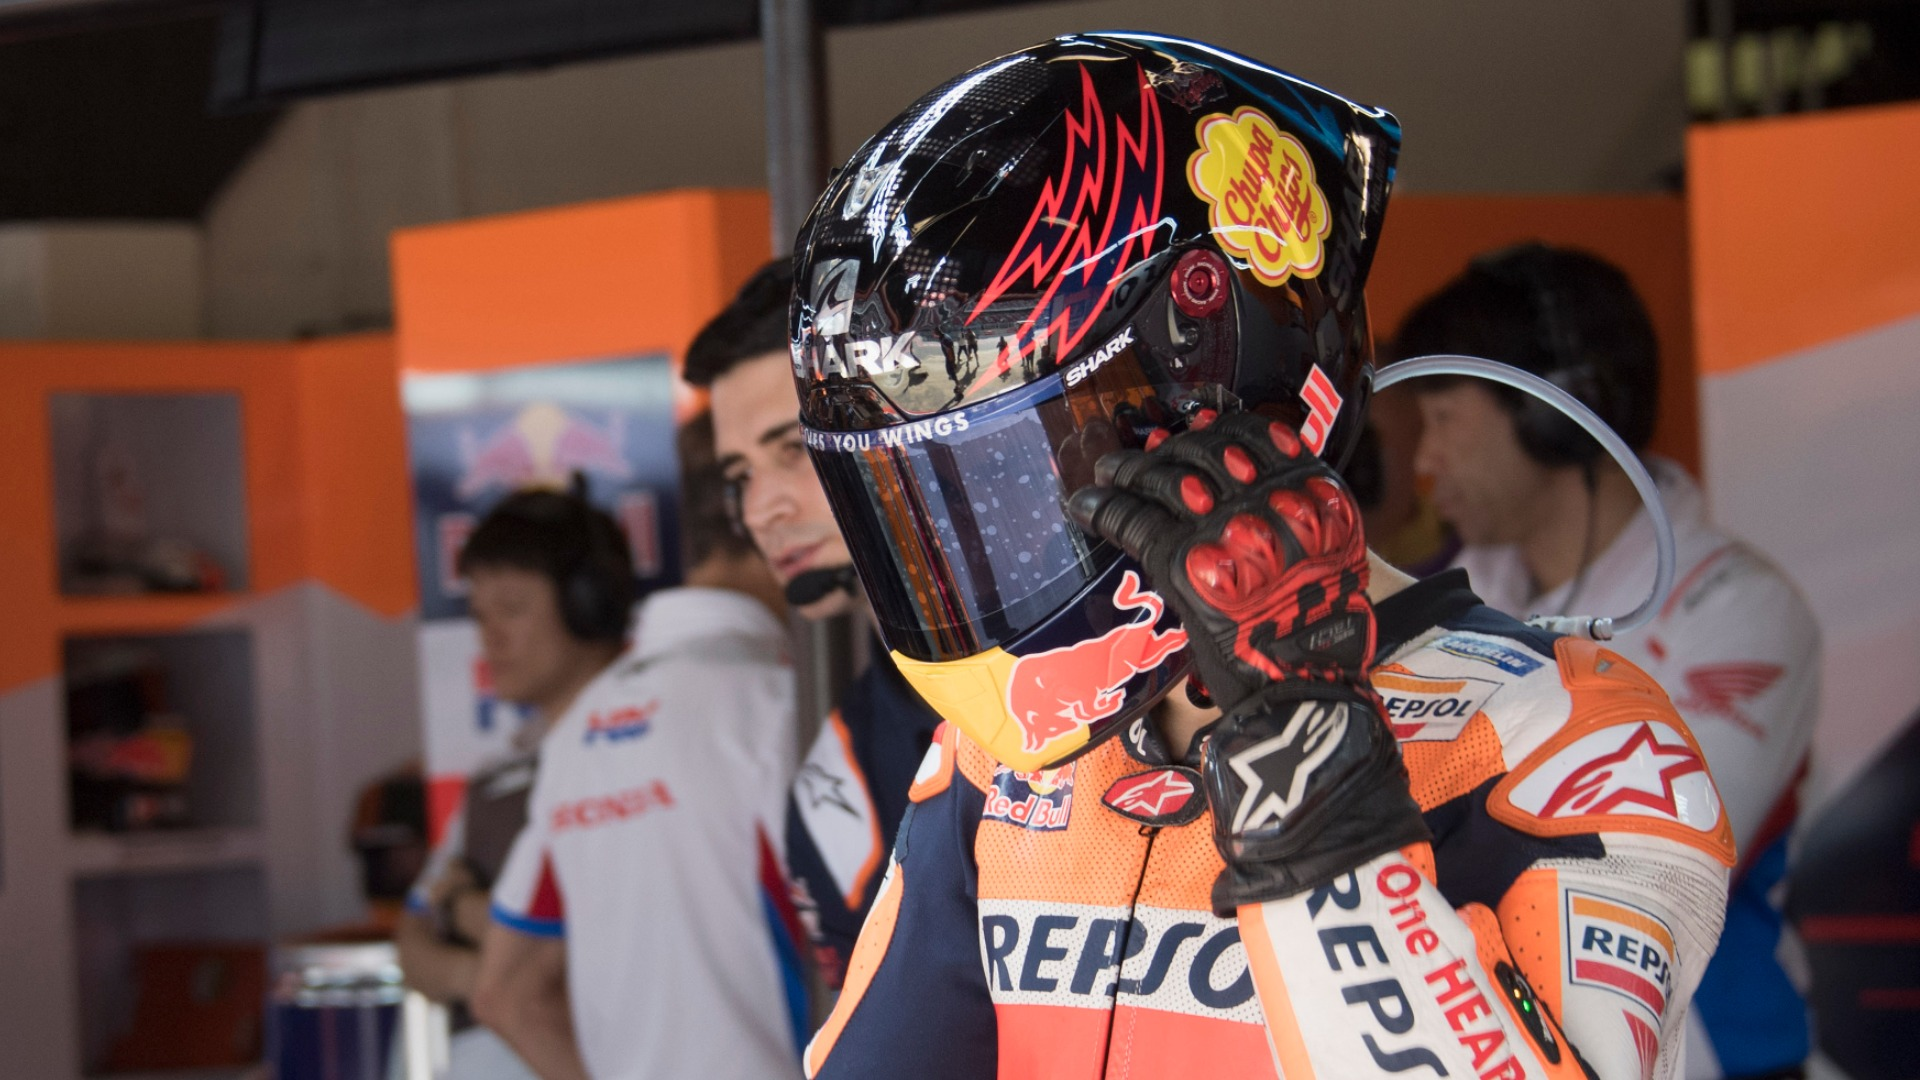 MotoGP Raceweek: A rookie mistake from a five-time champ! - Vinales slams Lorenzo